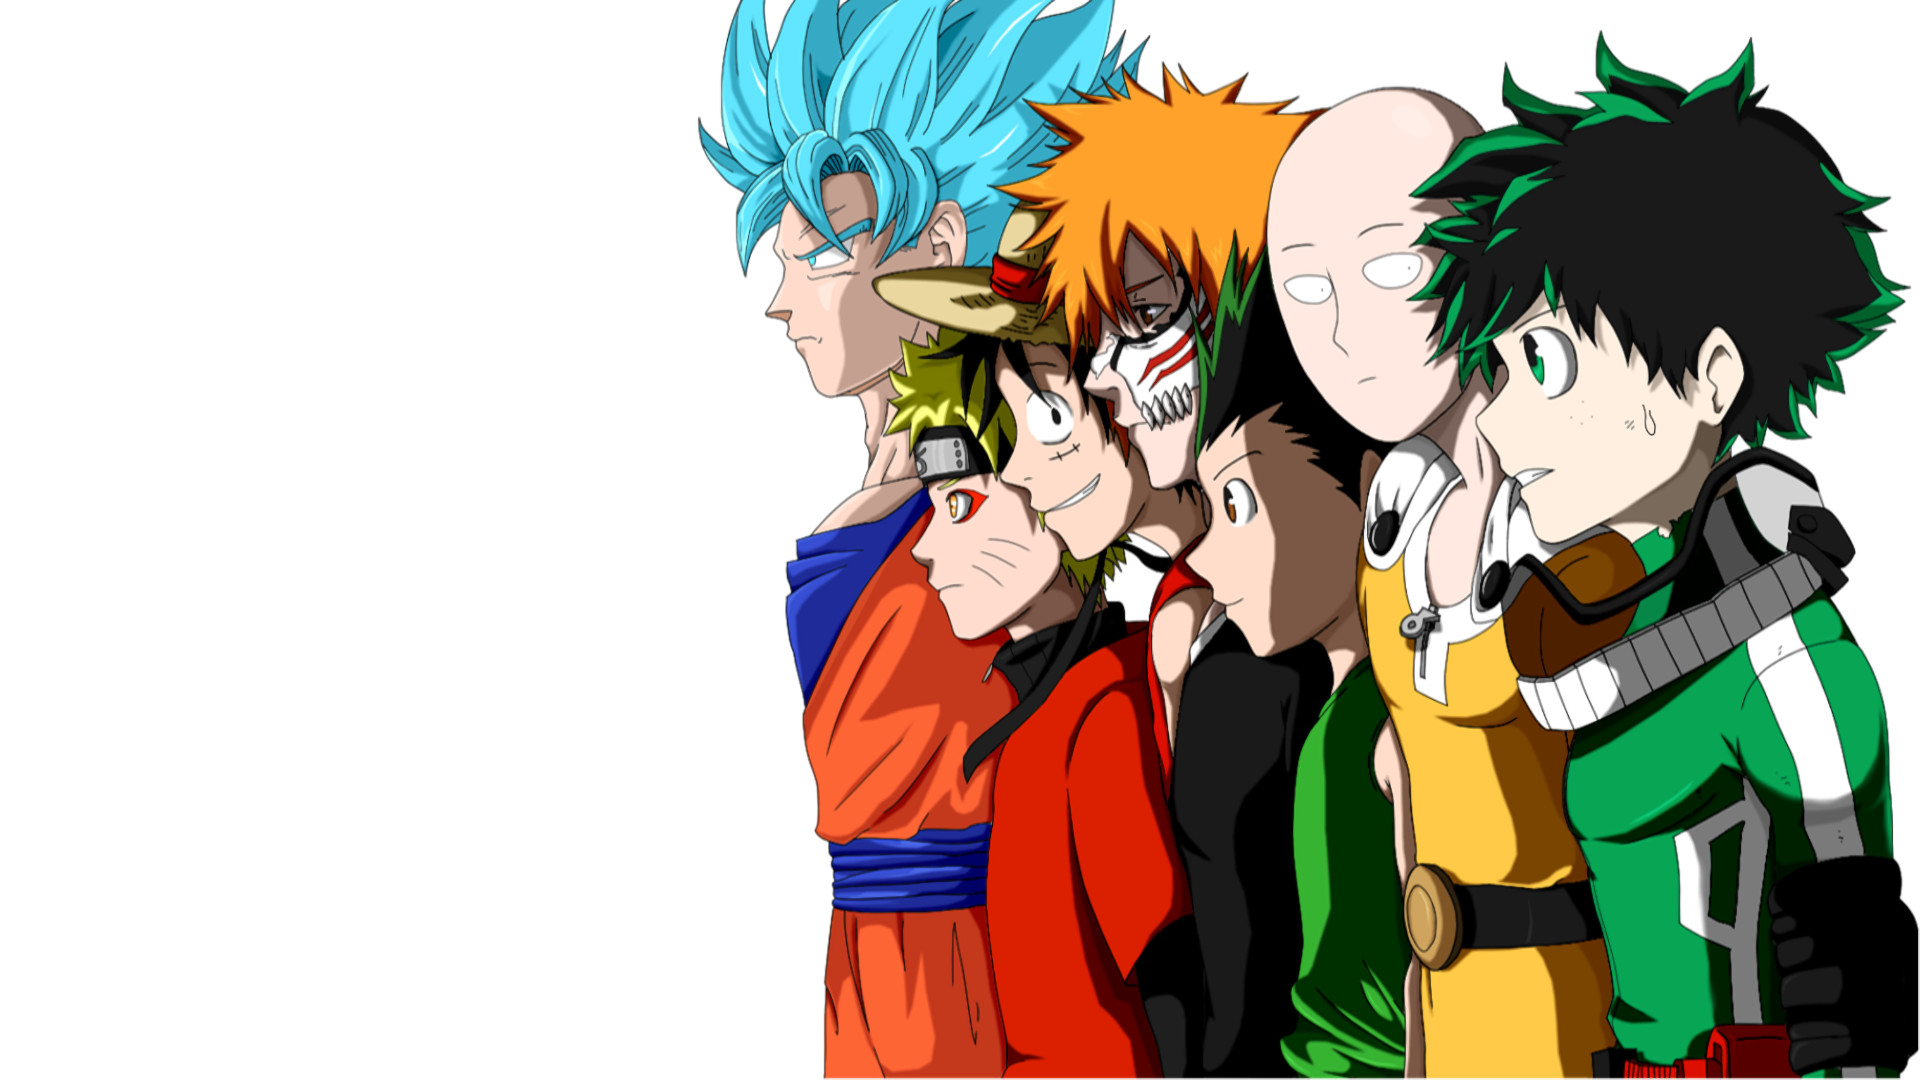 Goku Wallpaper Hd Naruto And Goku Wallpaper 74 Images